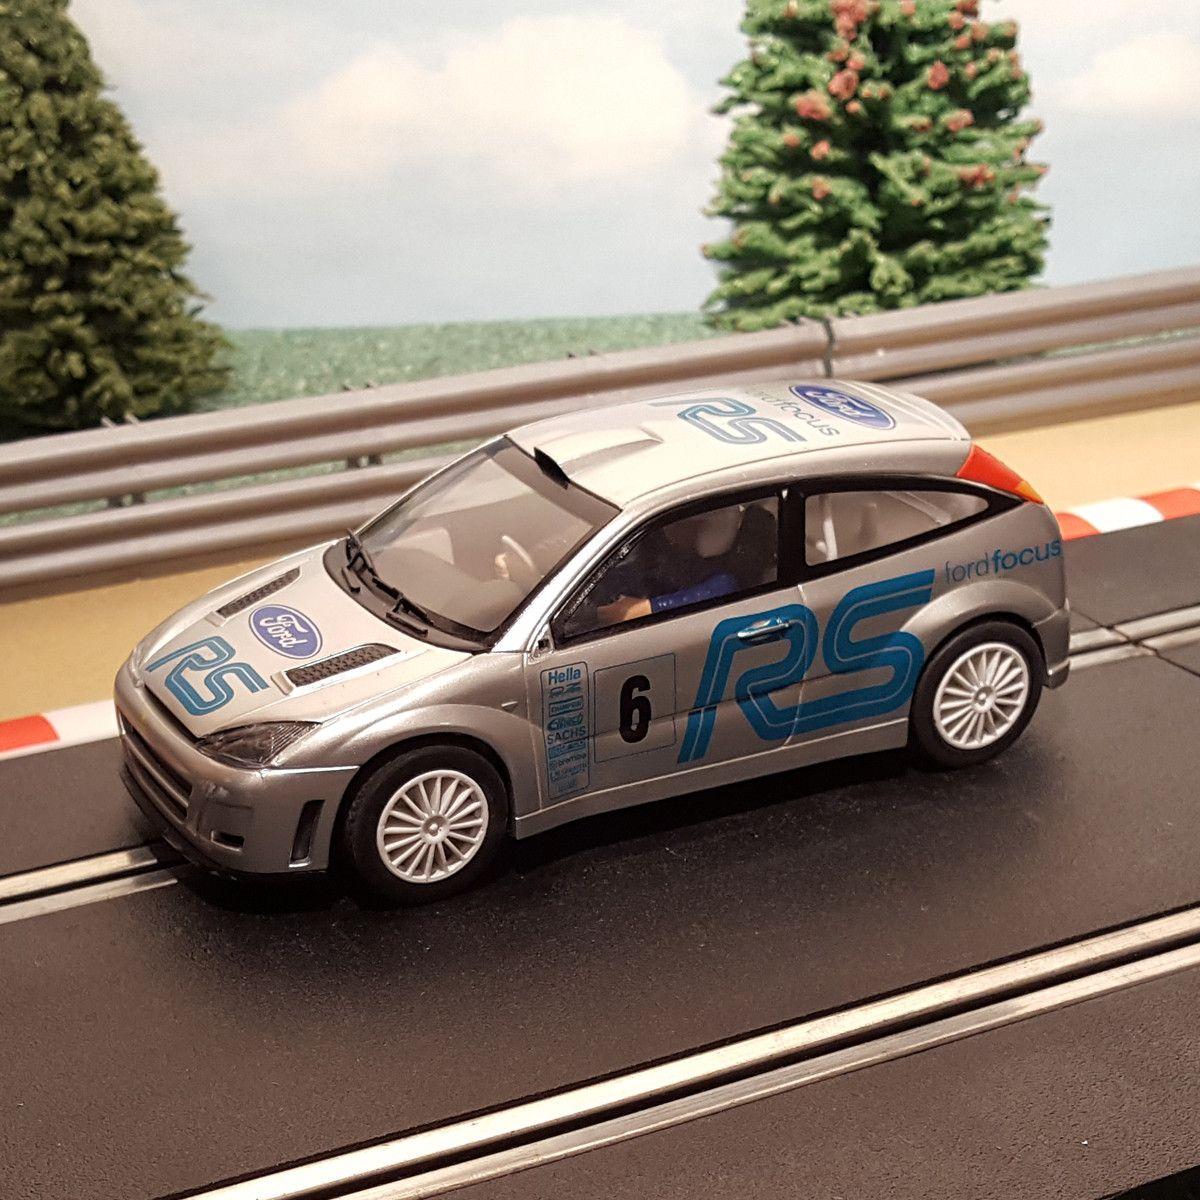 "Scalextric 1:32 Voiture-C3400 BMW Mini Cooper S /'Team SCALEXTRIC/"" #15 Mortimer"